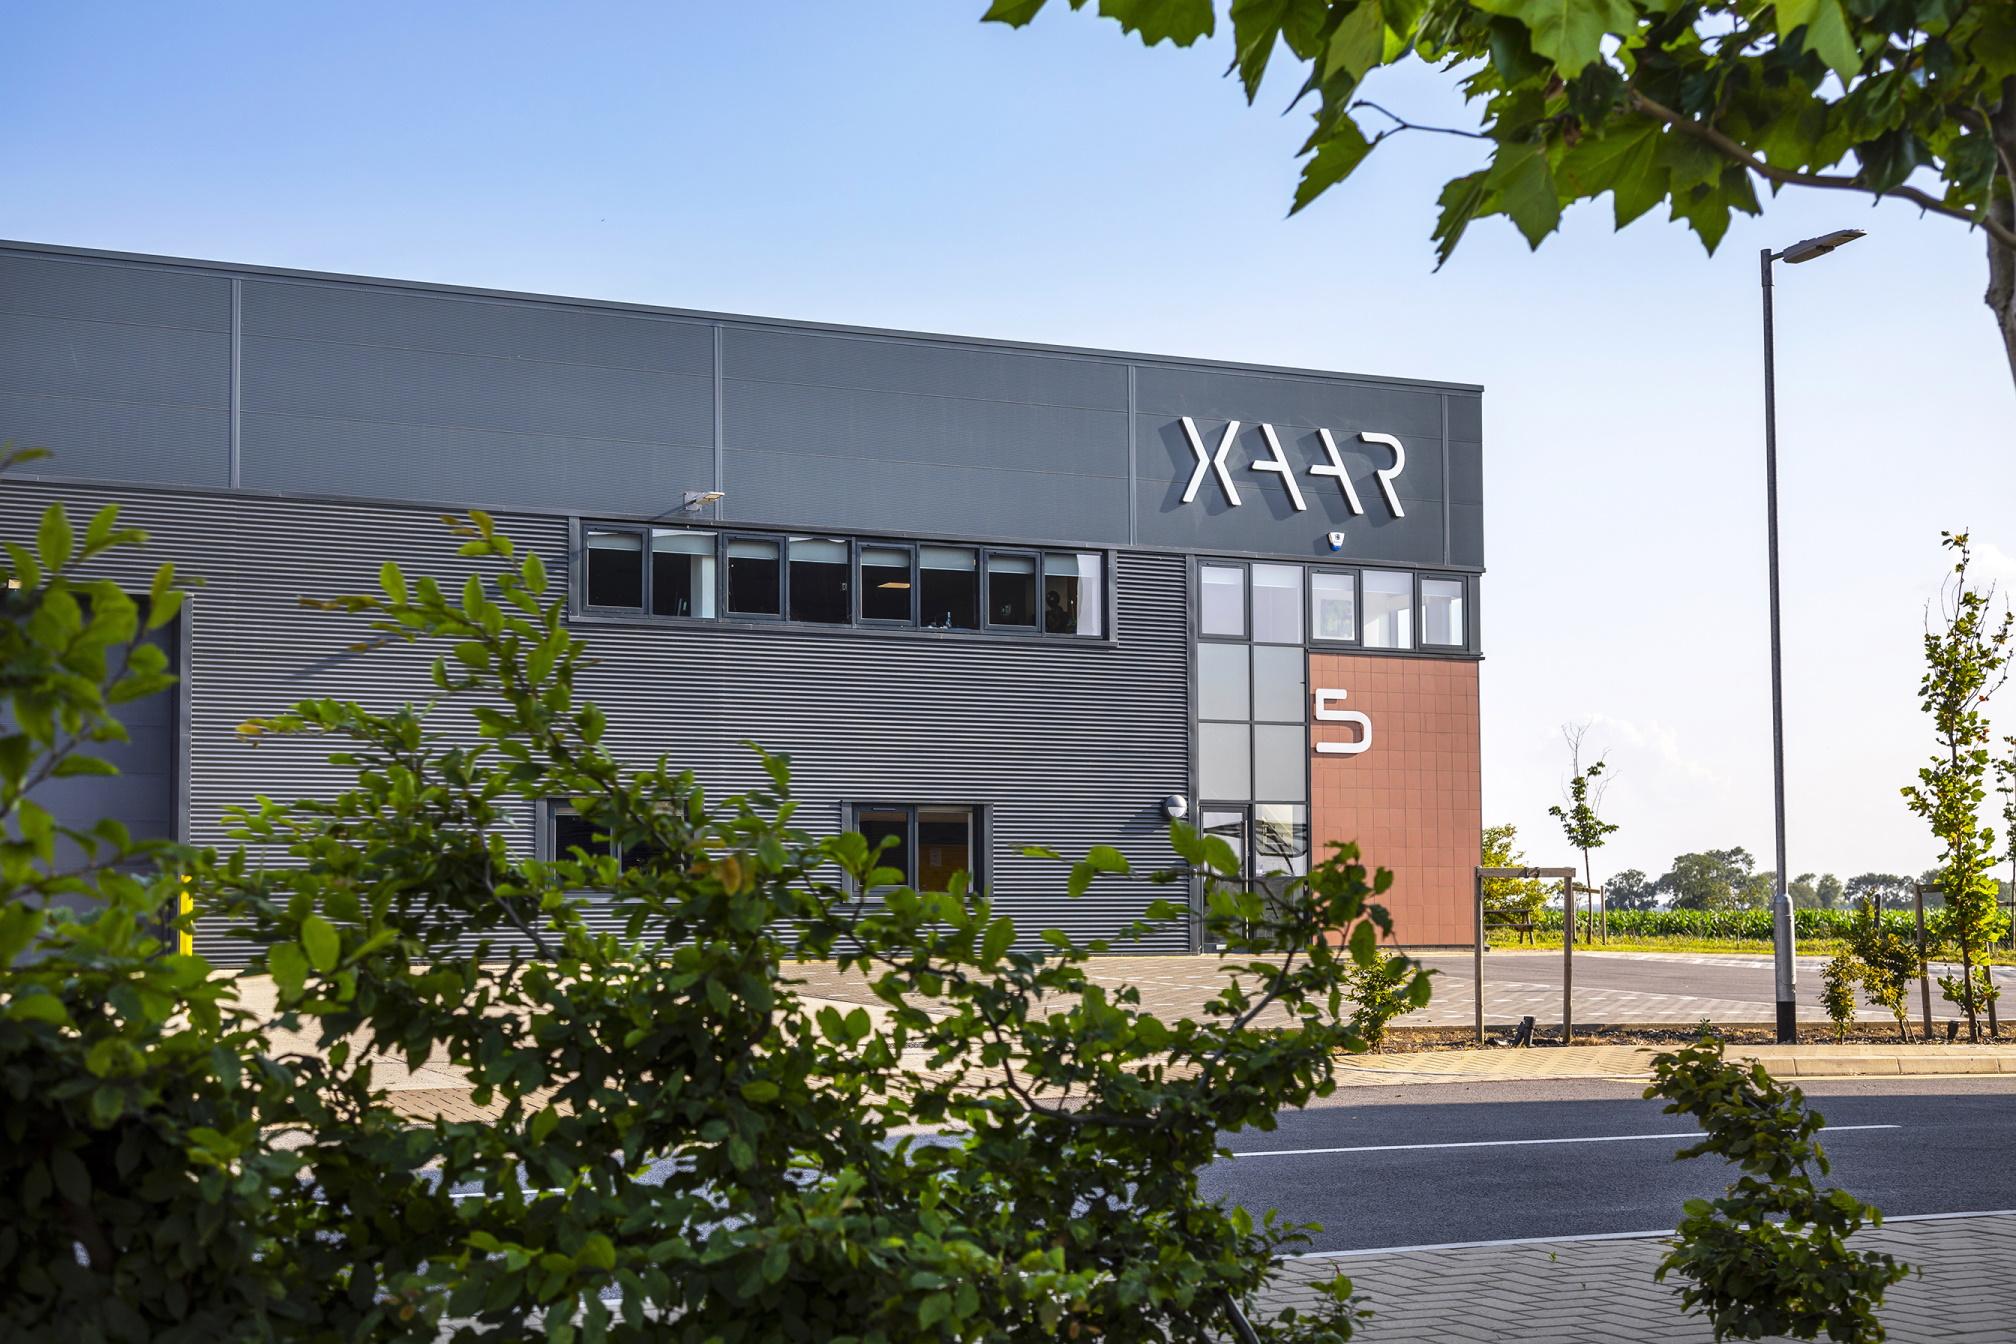 Xaar's new global headquarters in Cambridgeshire. Photo via Xaar.